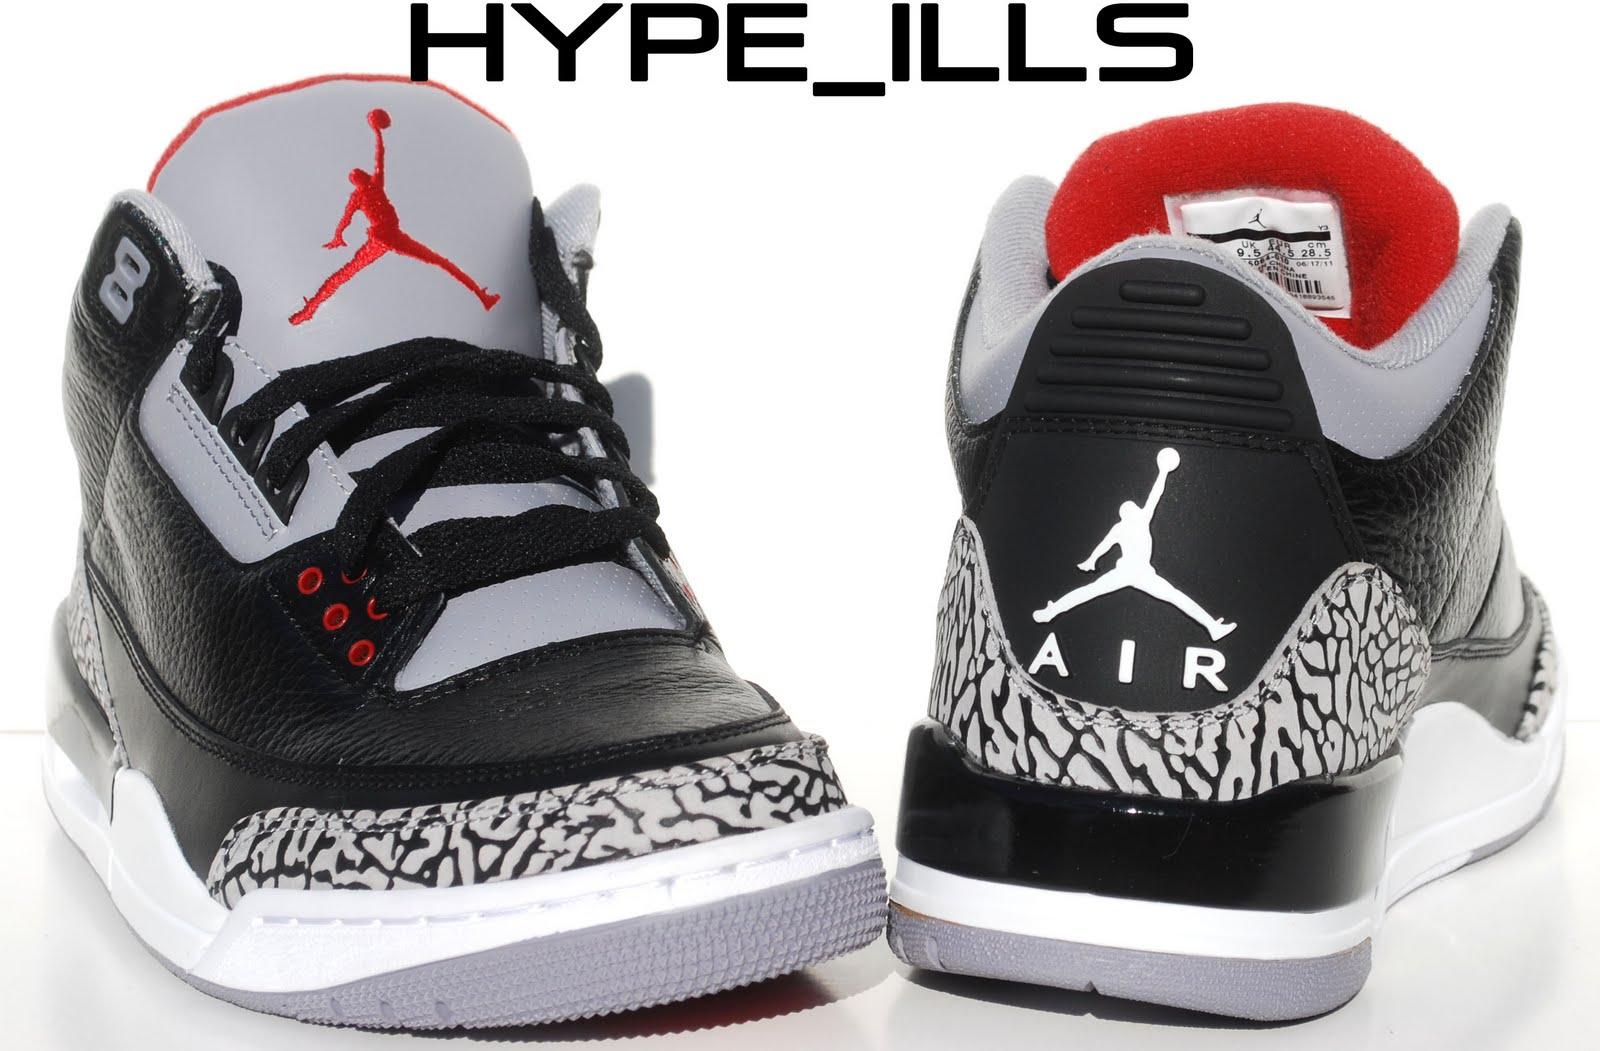 7a52fd39a375 The Jordan 3